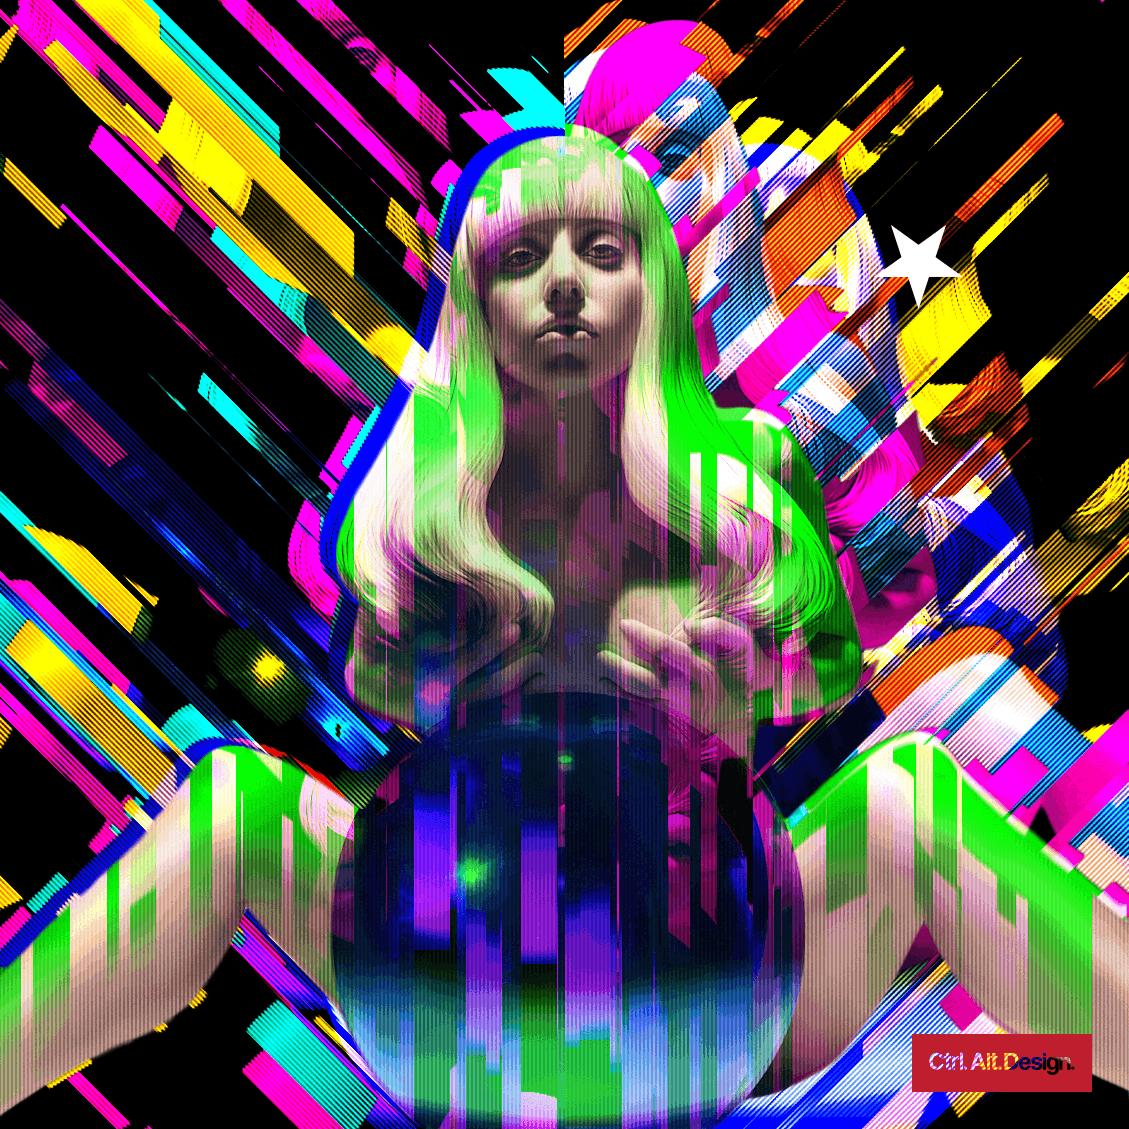 Lady-Gaga_ArtPop_Cover_Remix_Dustrial_CtrlAltDesign_002